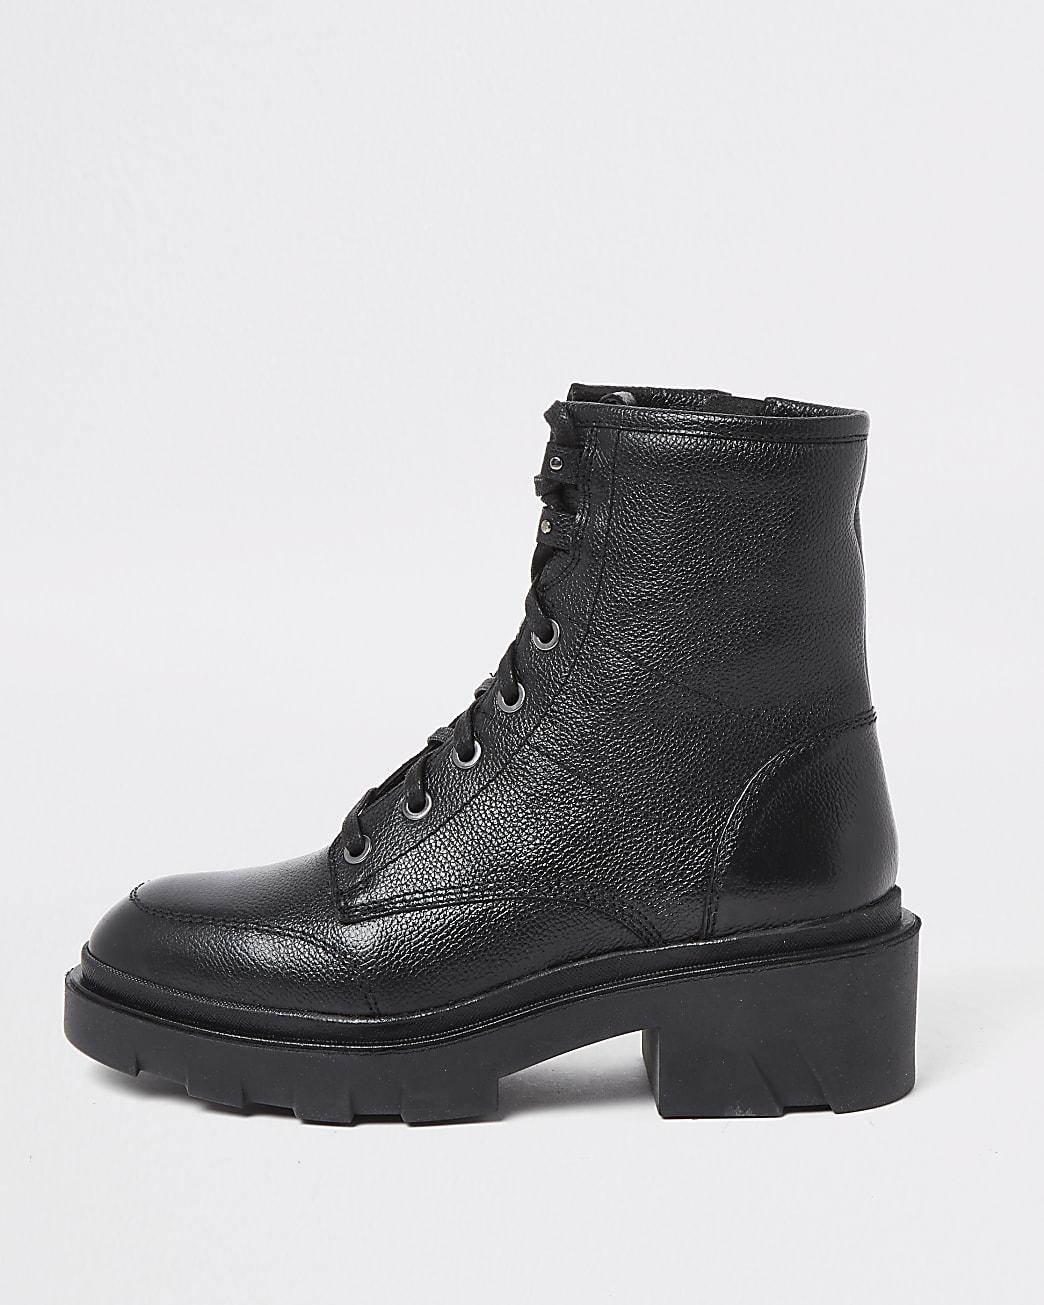 Black chunky biker boots